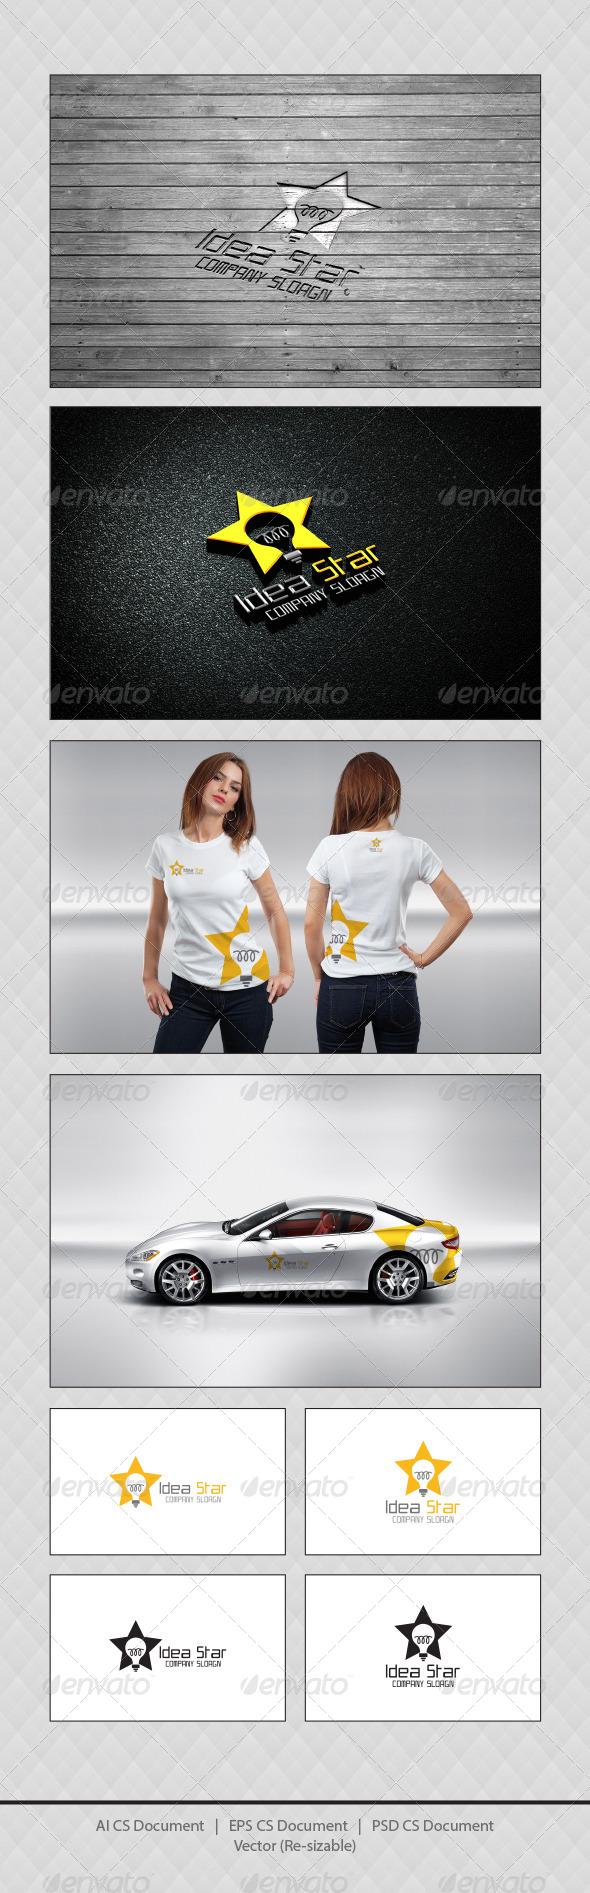 GraphicRiver Idea Star Logo Templates 4367592